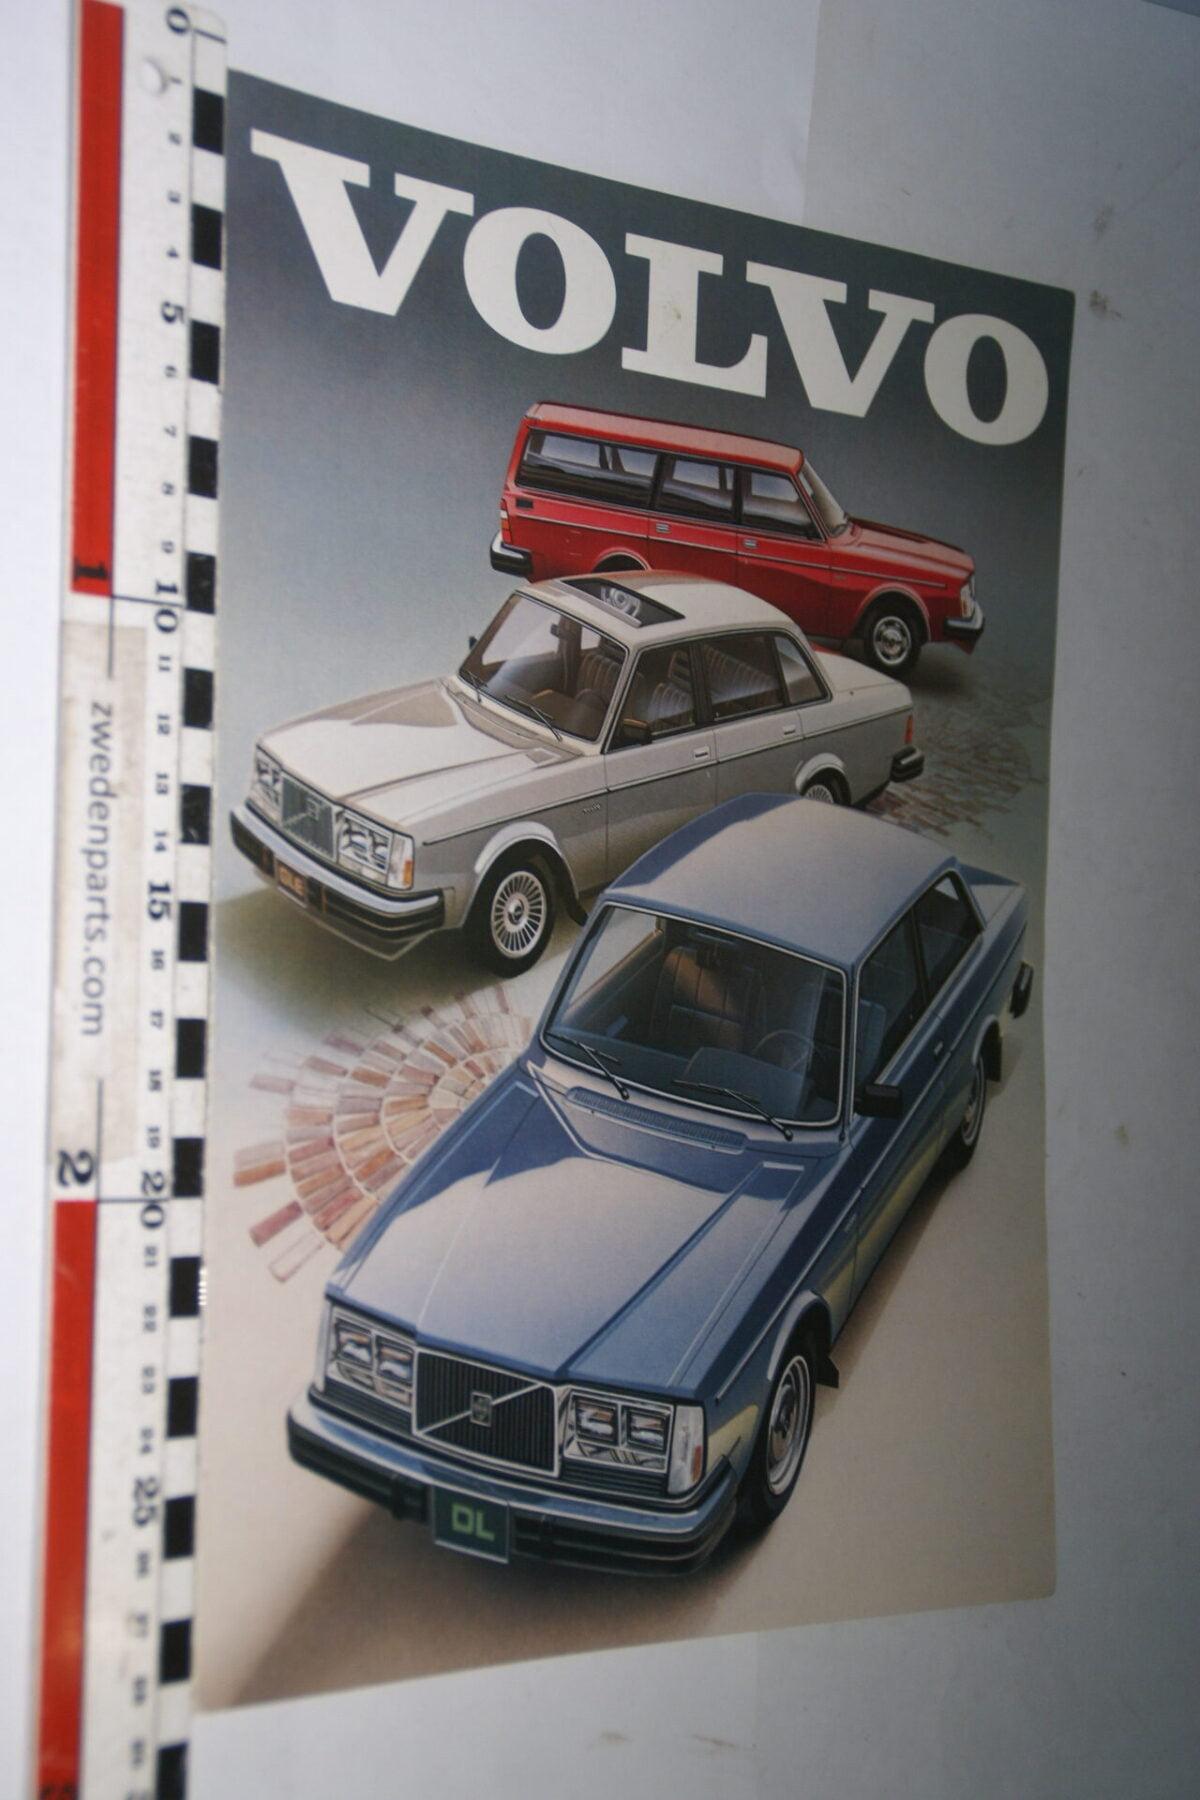 DSC07635 ca 1980 originele brochure Volvo 245 244 244GLT 242 nr ASP 031080200, English-4305ef69